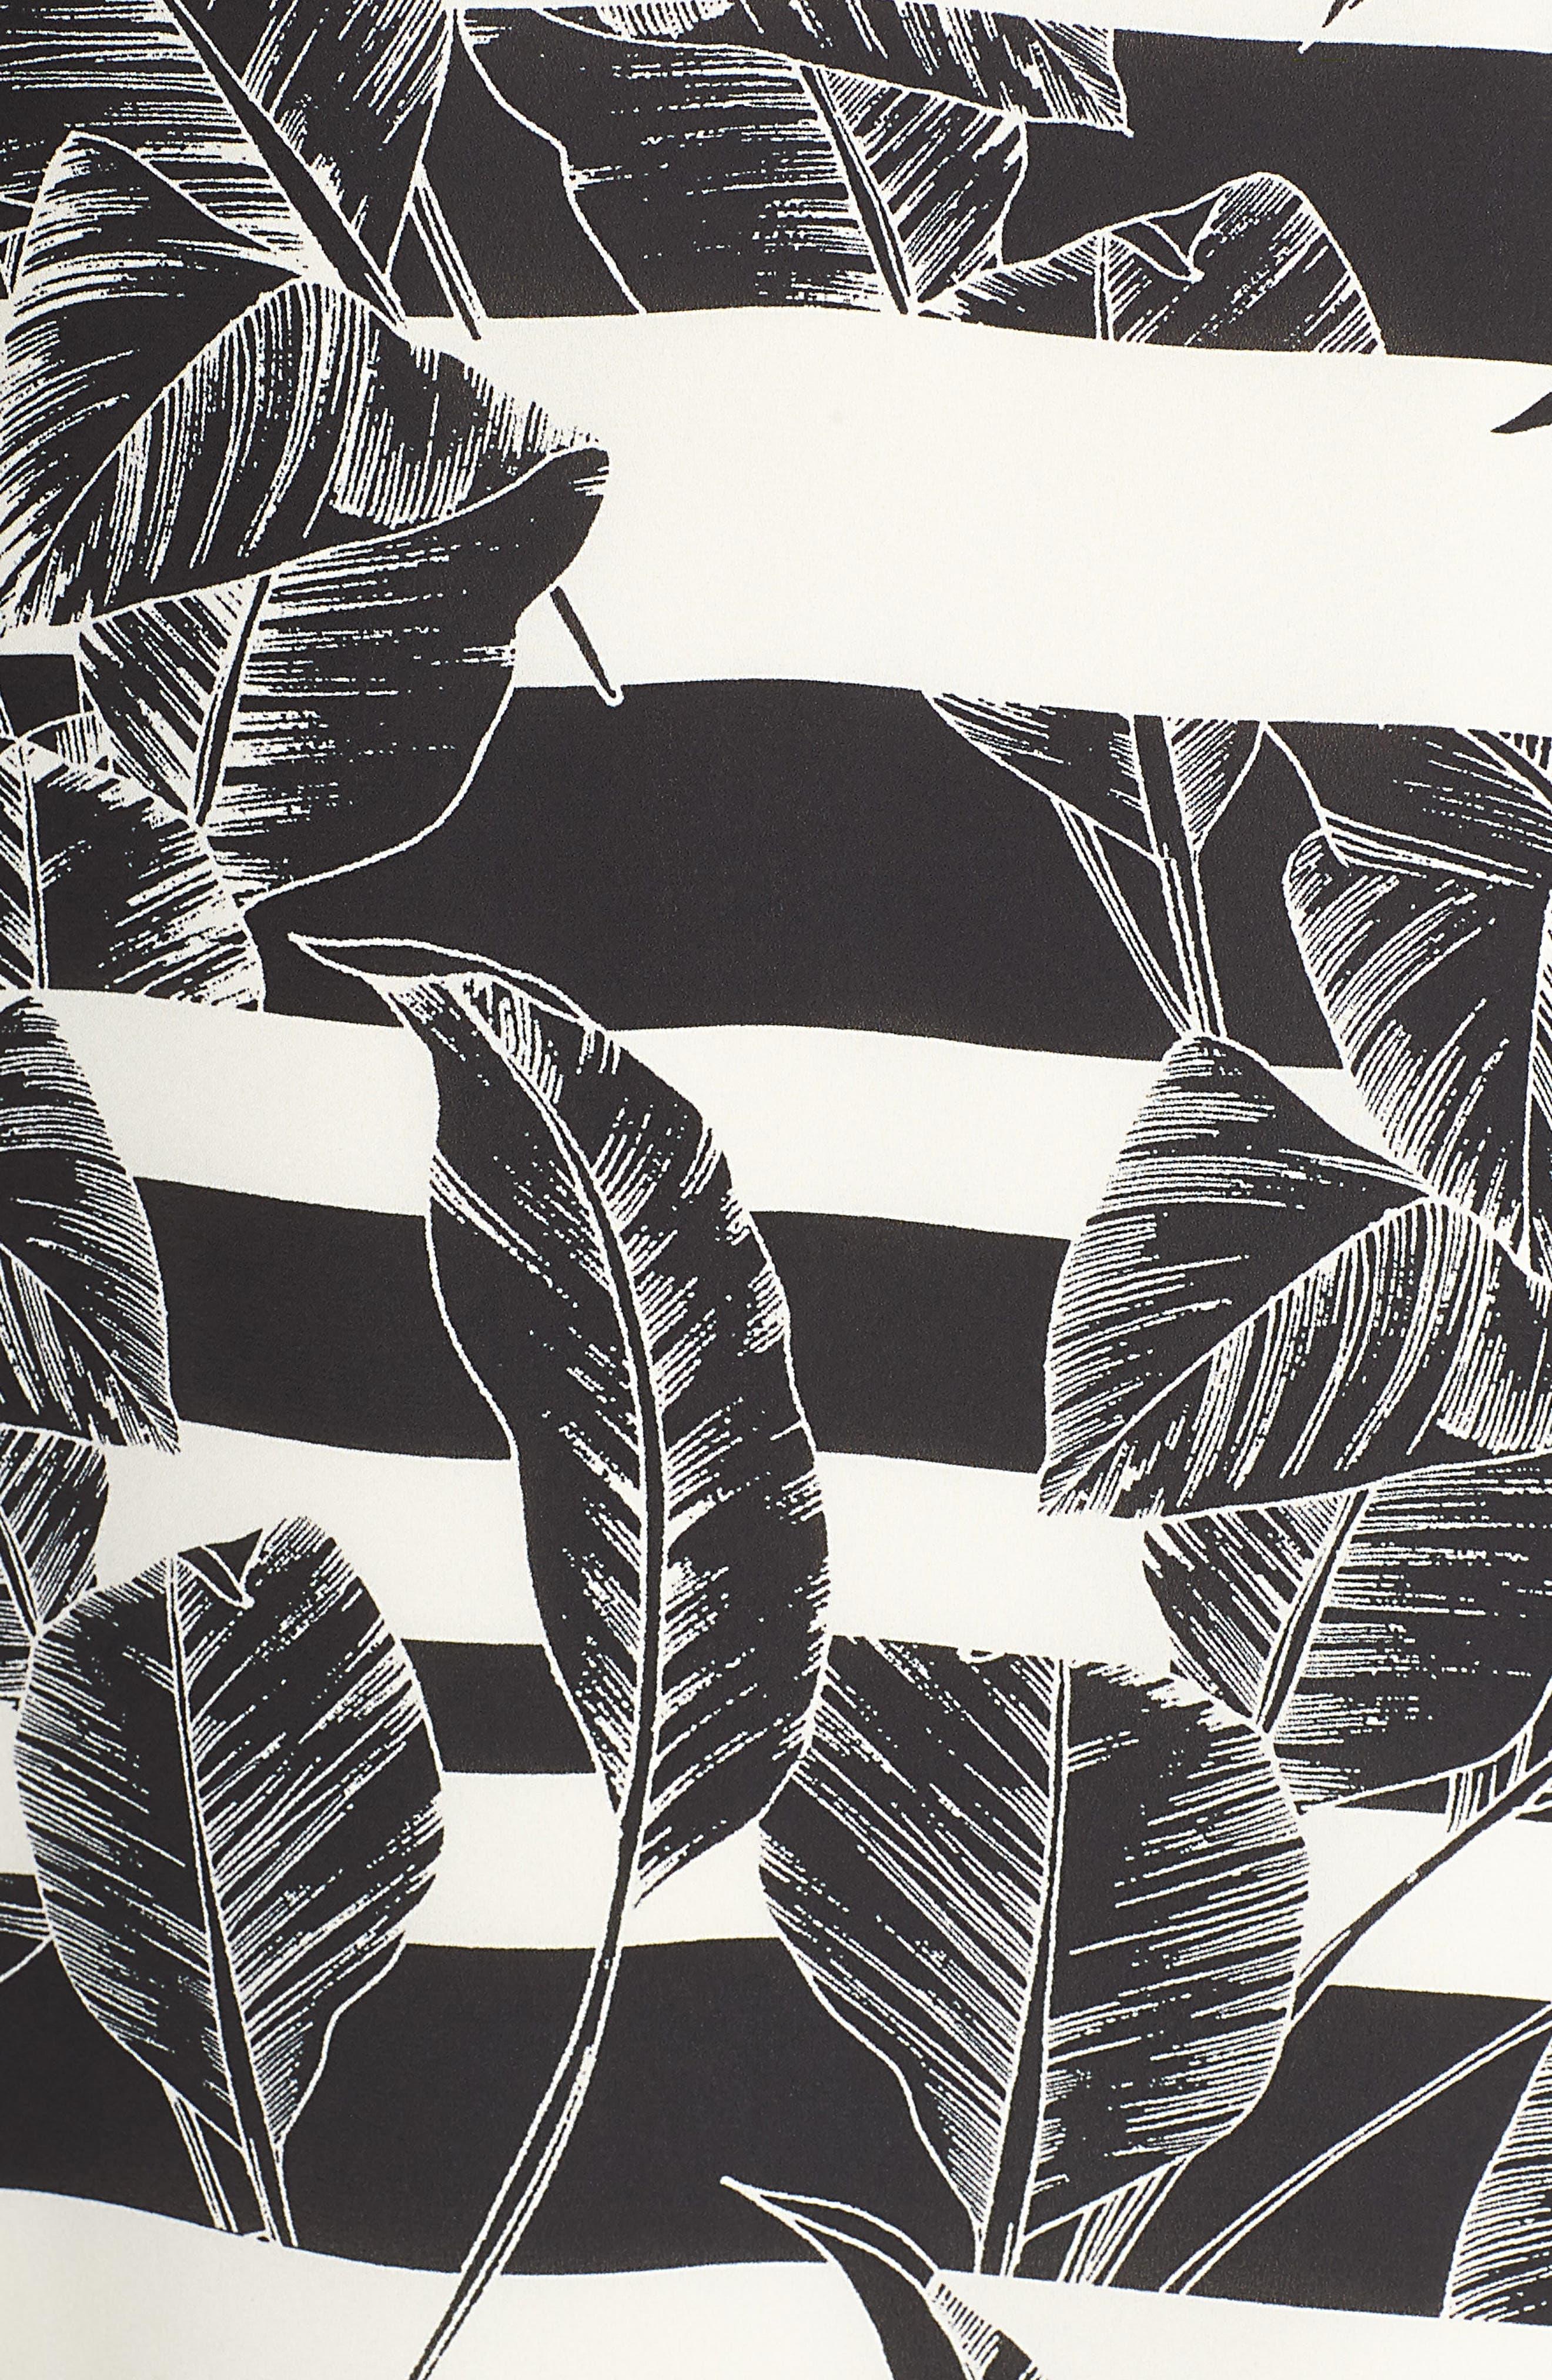 VINCE CAMUTO, Tropical Shadows Midi Slipdress, Alternate thumbnail 5, color, RICH BLACK